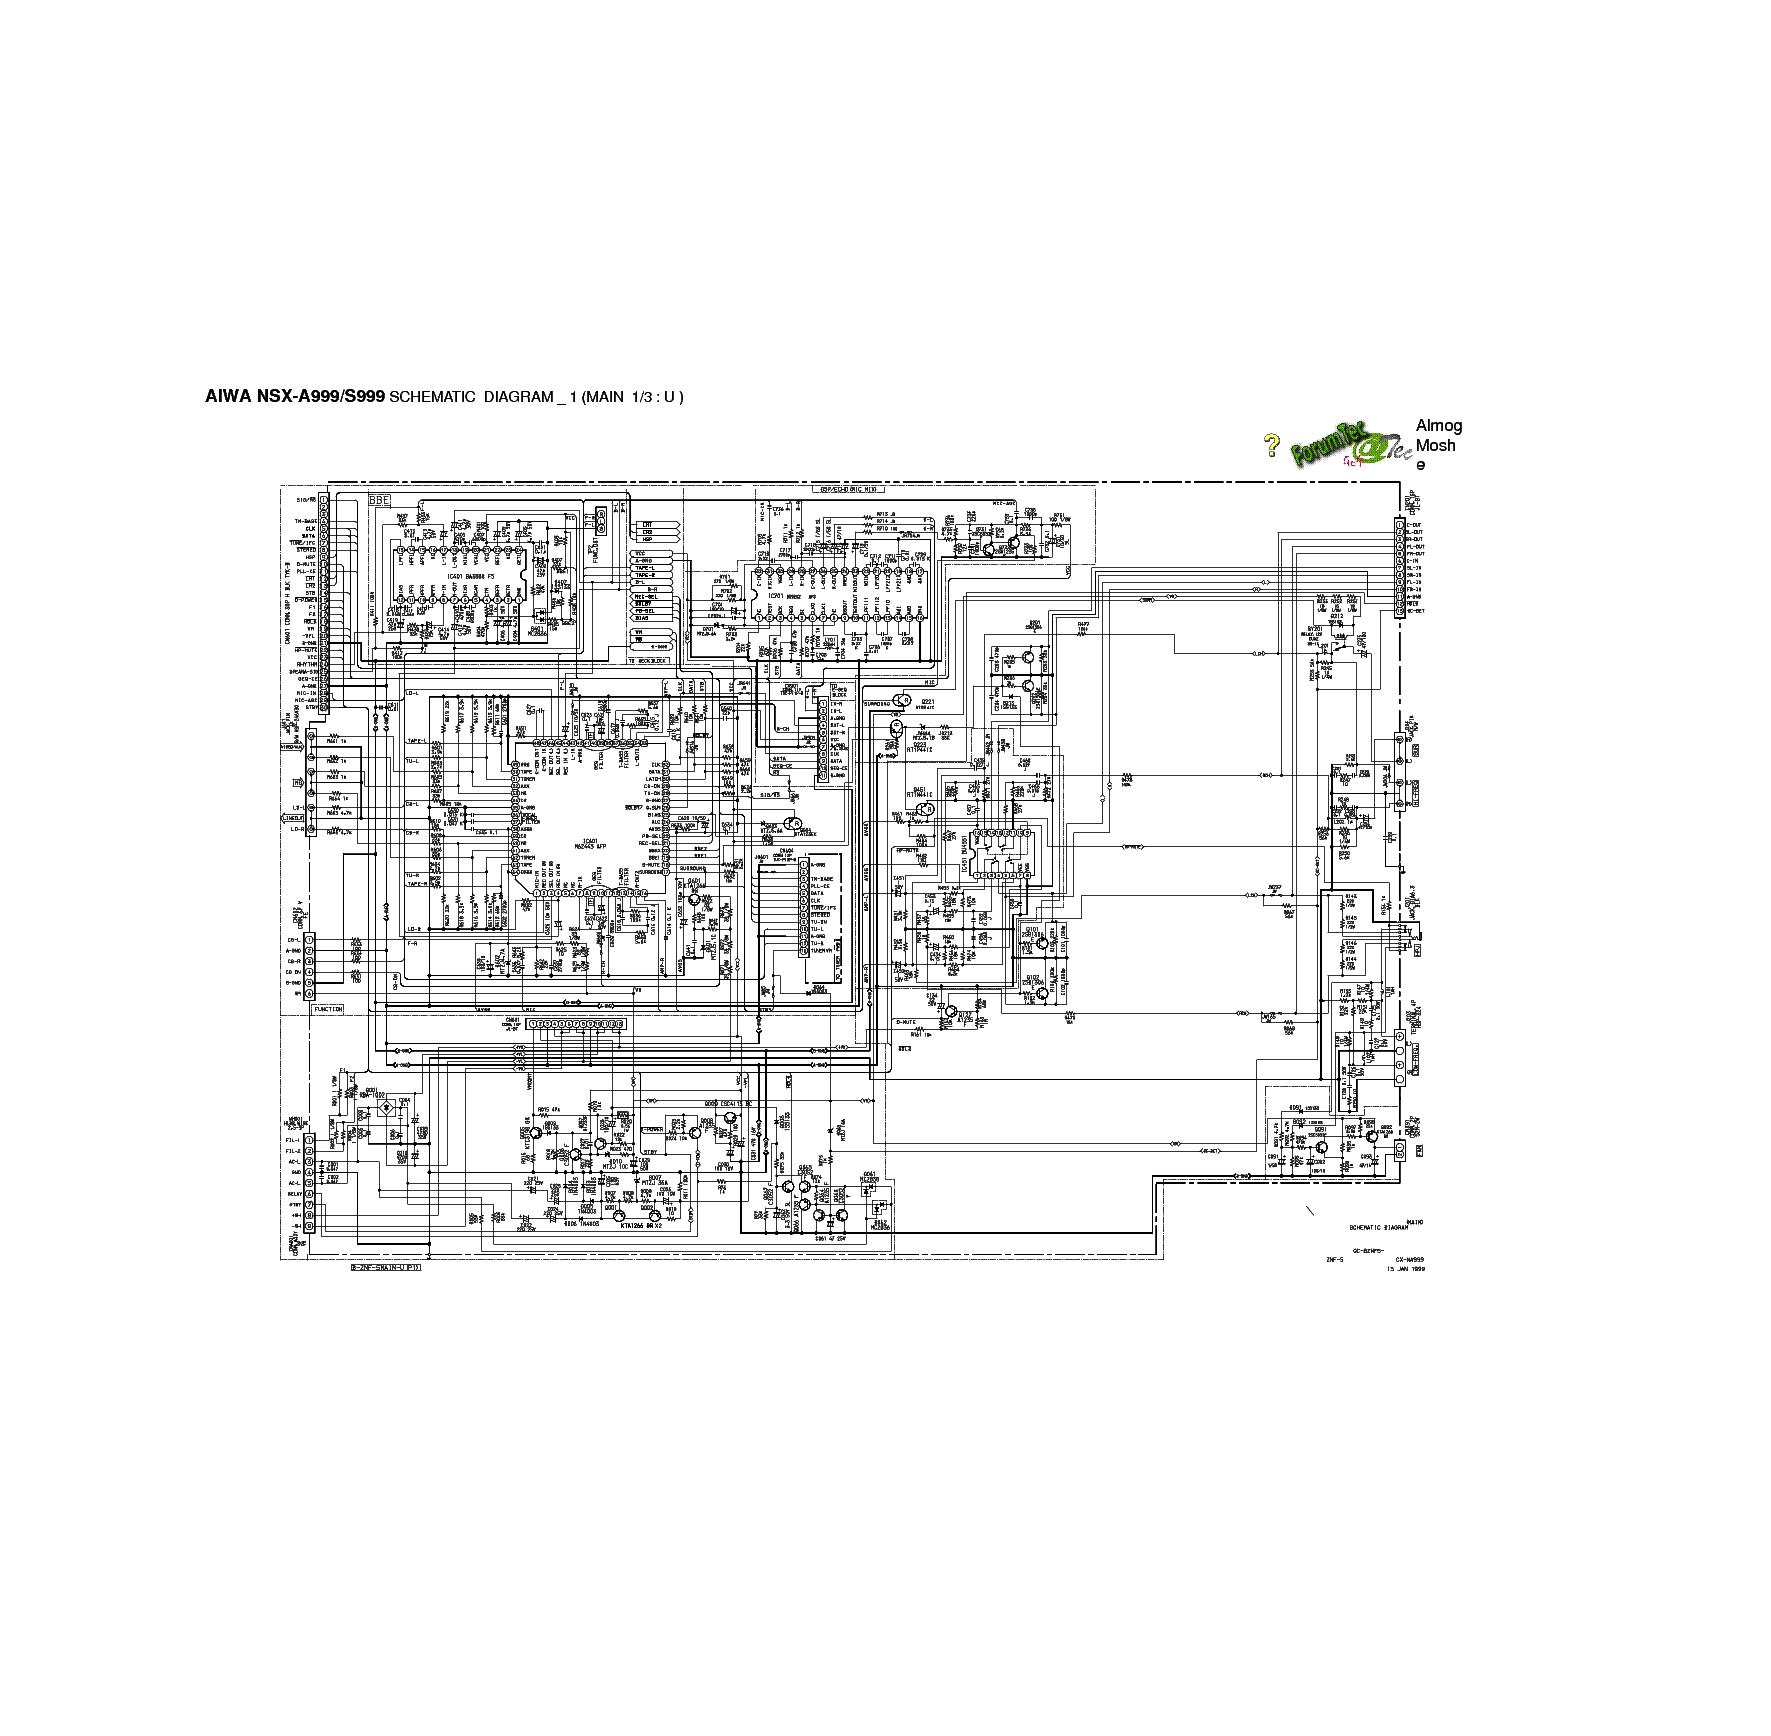 aiwa nsx k950 service manual download schematics eeprom repair rh elektrotanya com